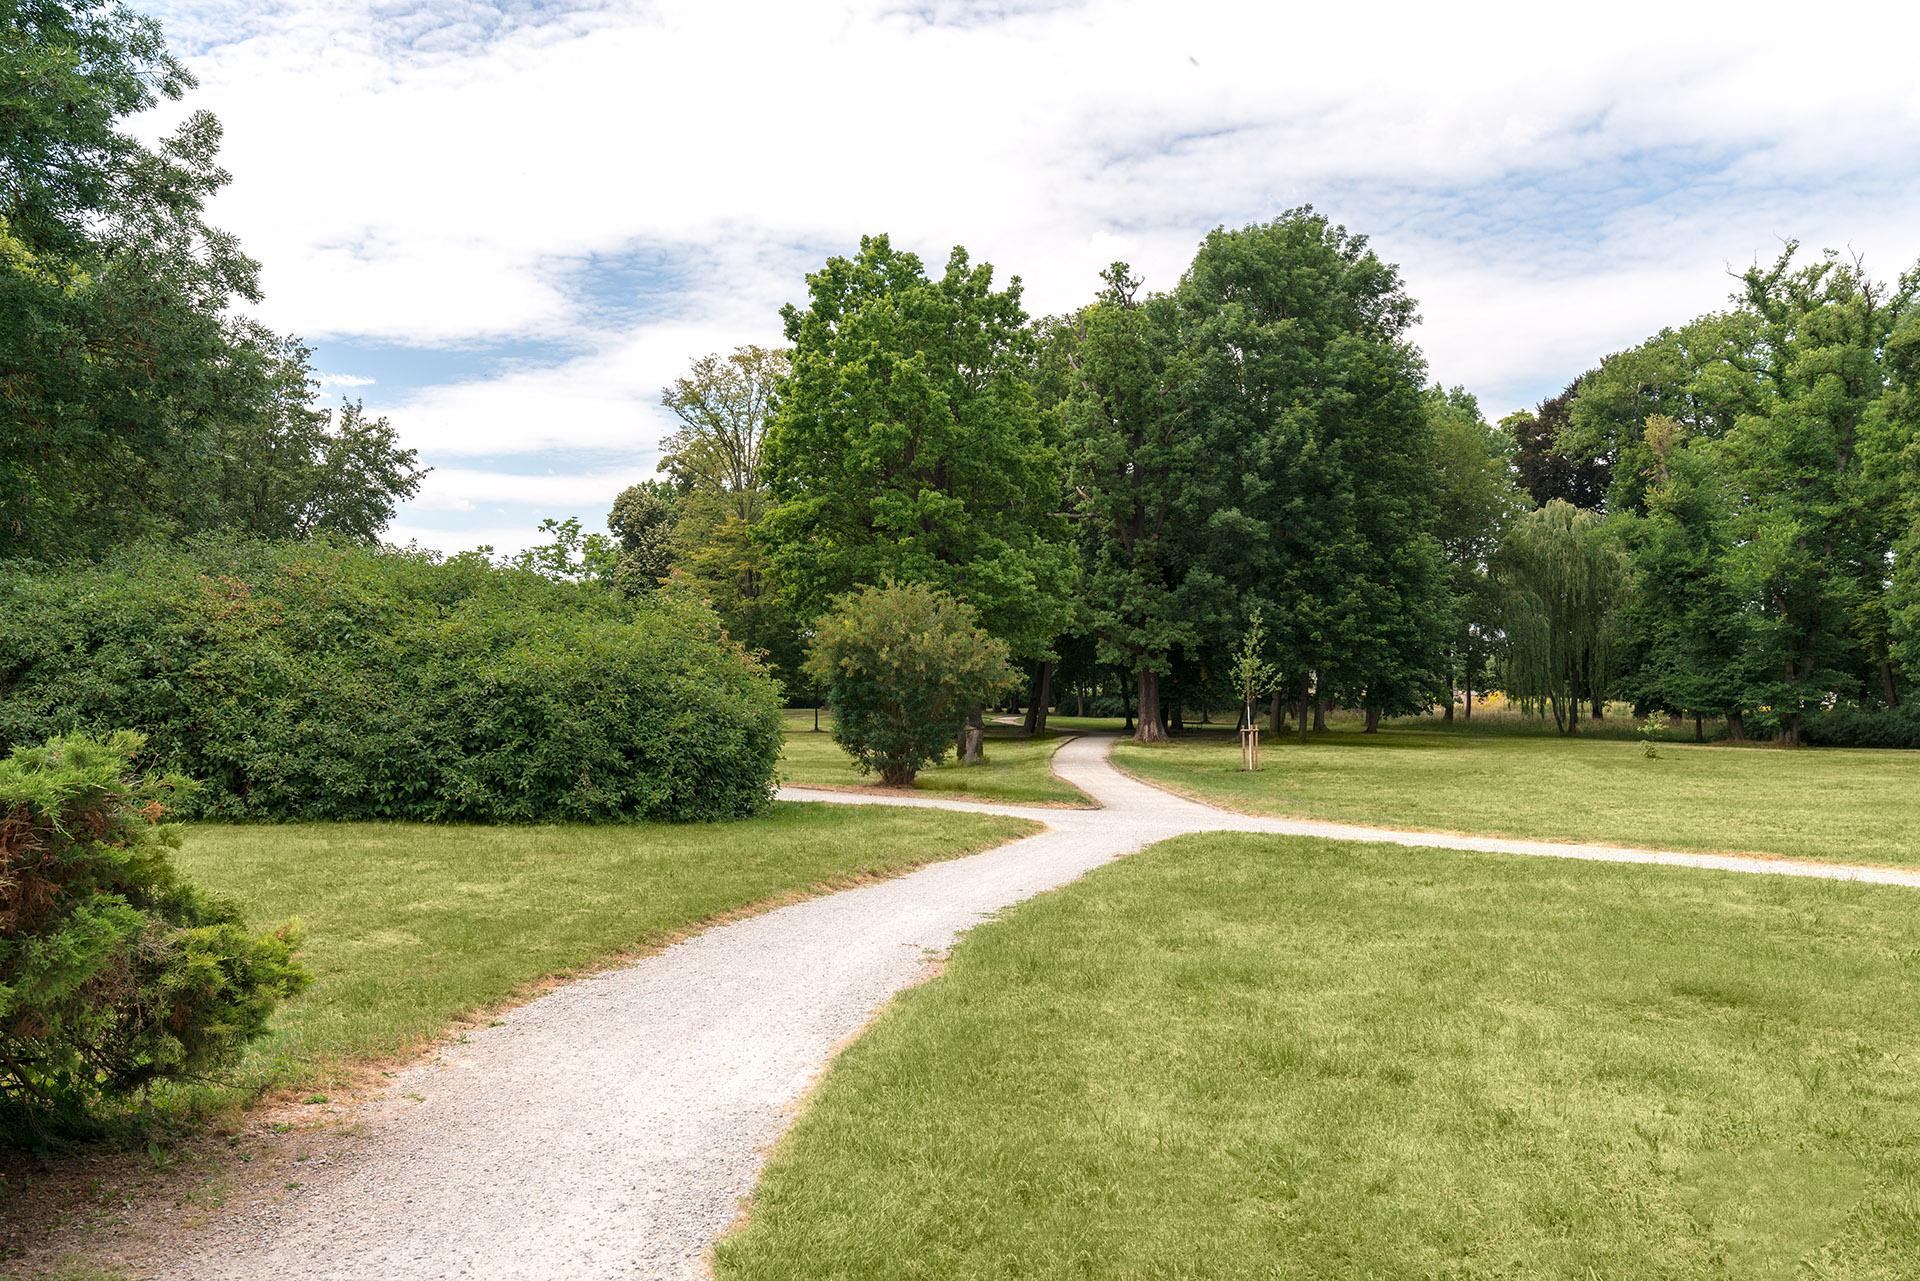 Sondershausen-Schlosspark-Schatzkammer-Thüringen-Markus-Glahn.jpg